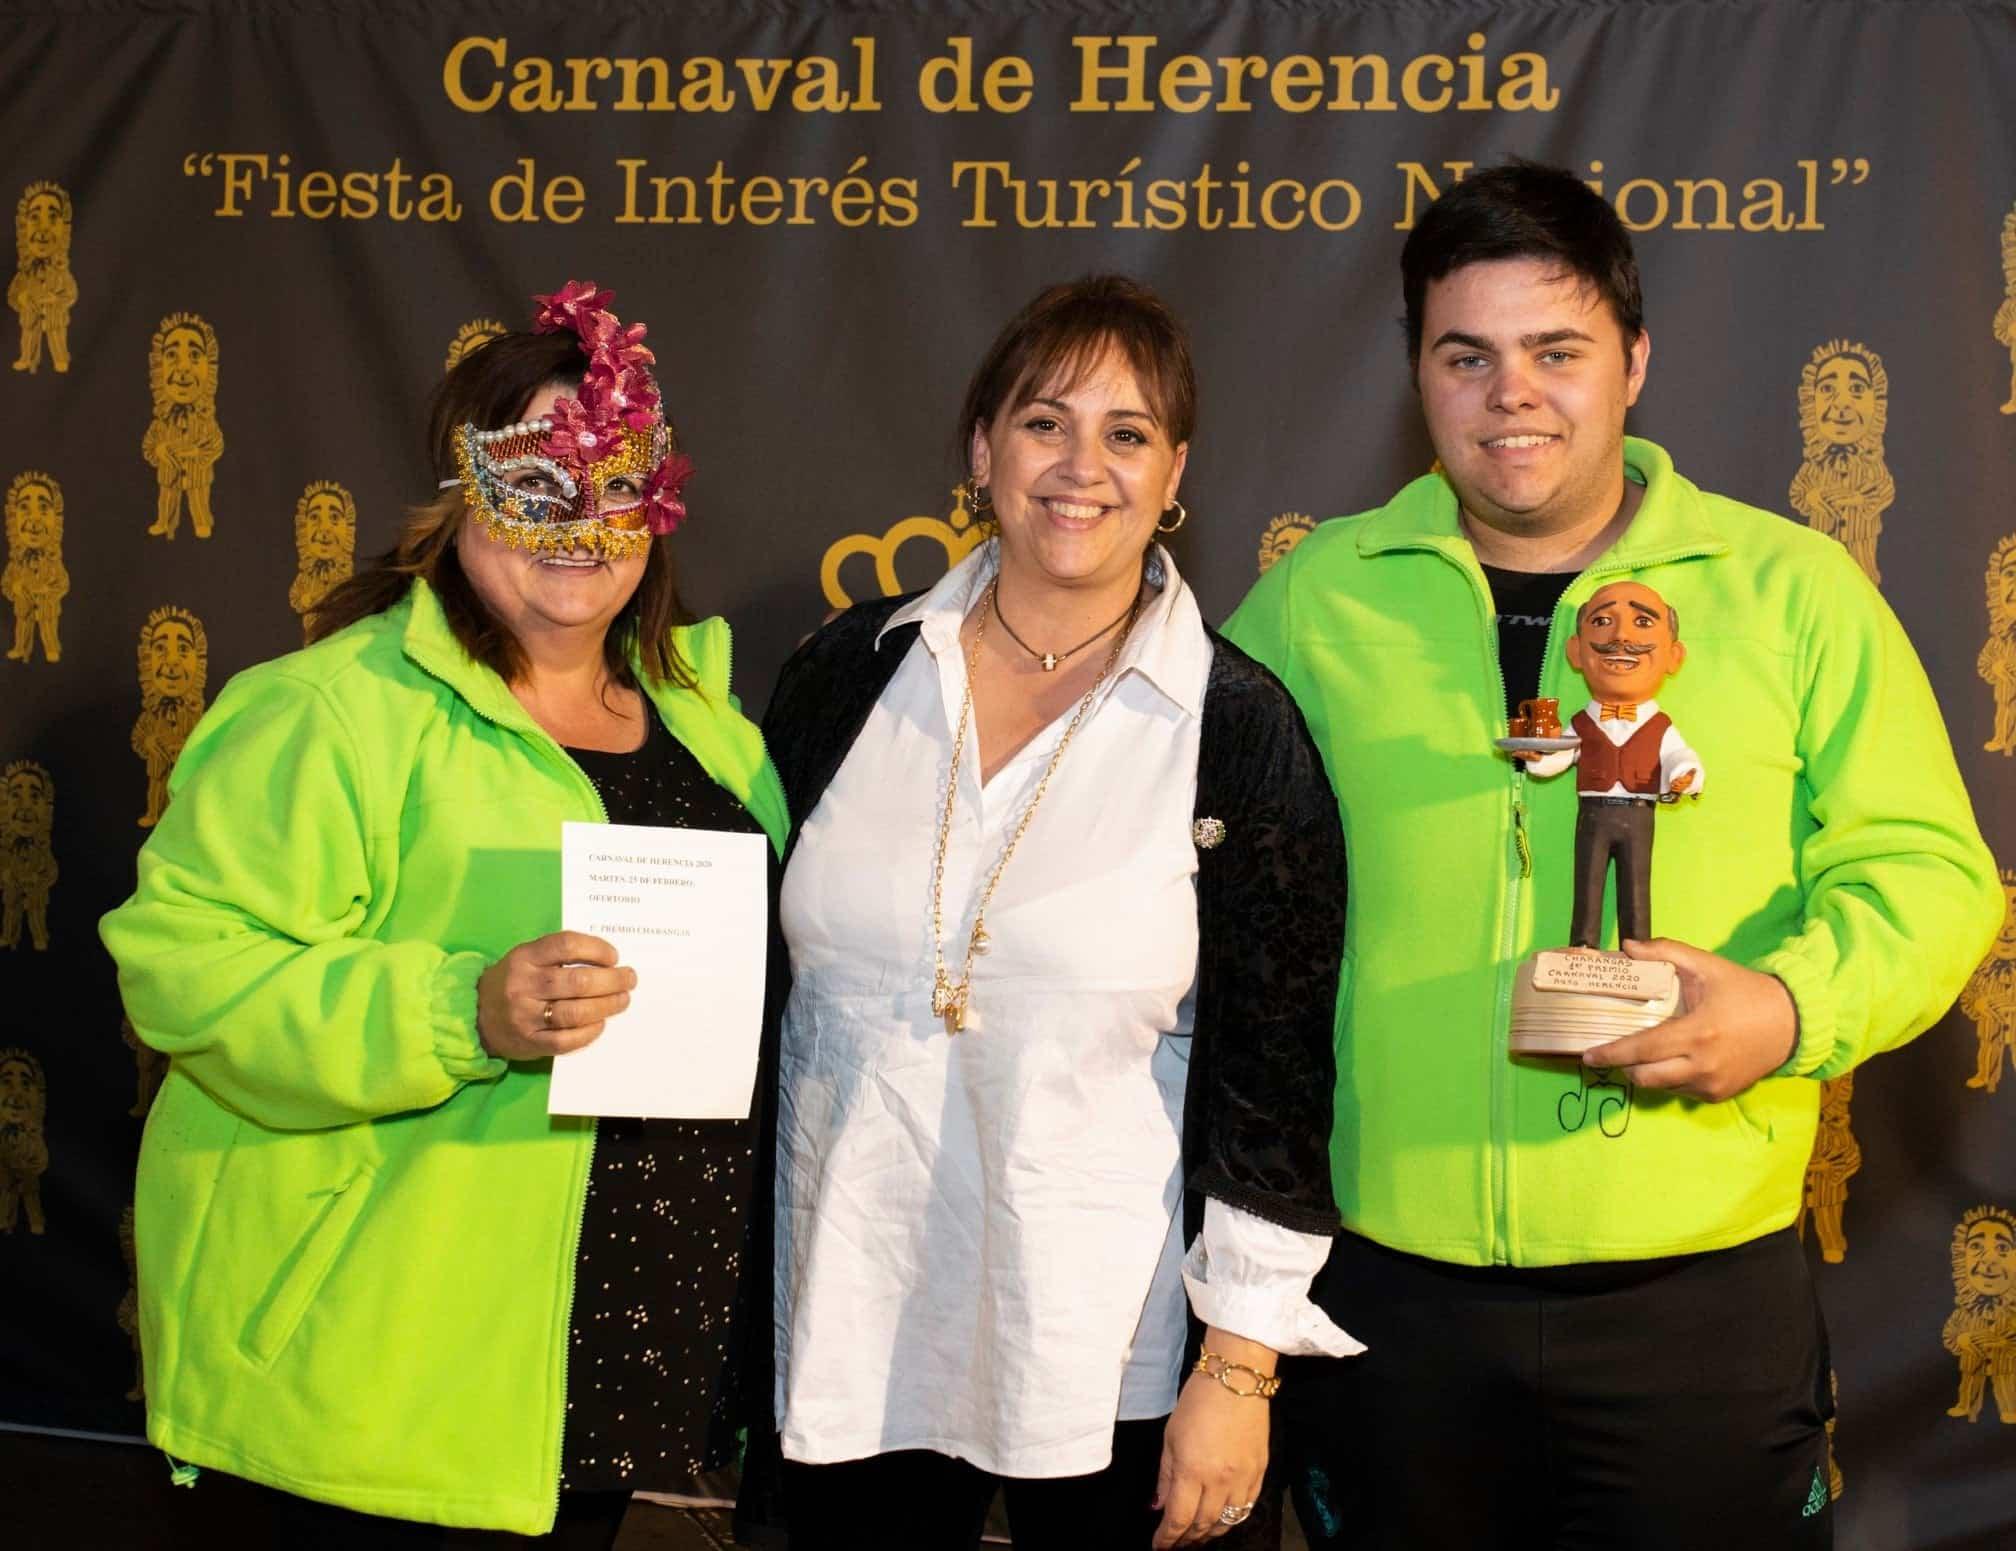 Carnaval de herencia 2020 ofertorio 70 - Selección de fotografías del Ofertorio del Carnaval de Herencia